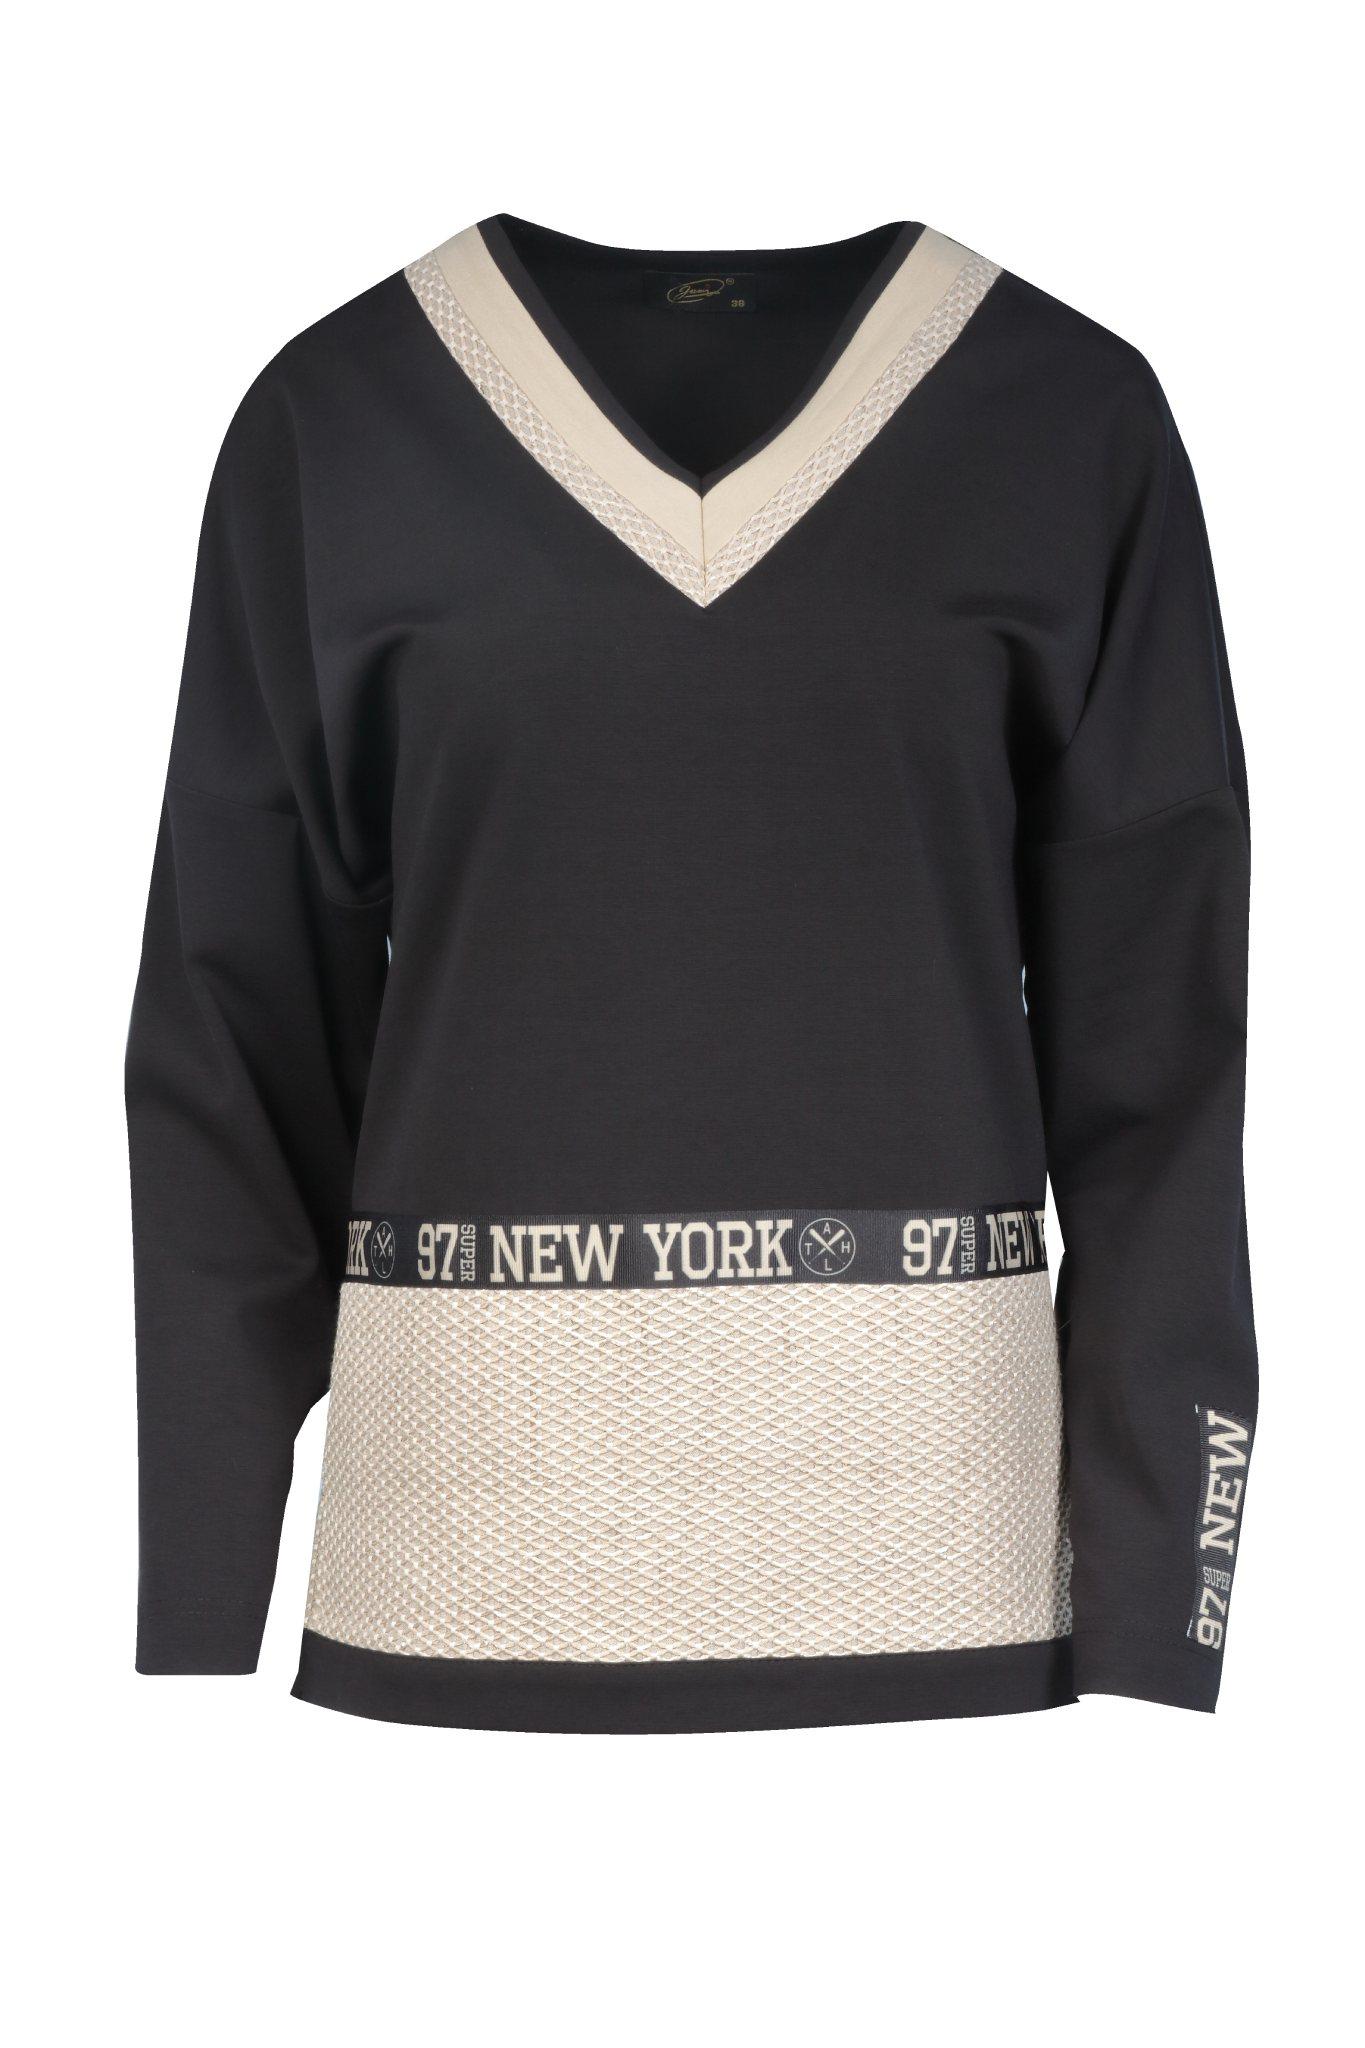 1296 Jumitex czarna bluza New York